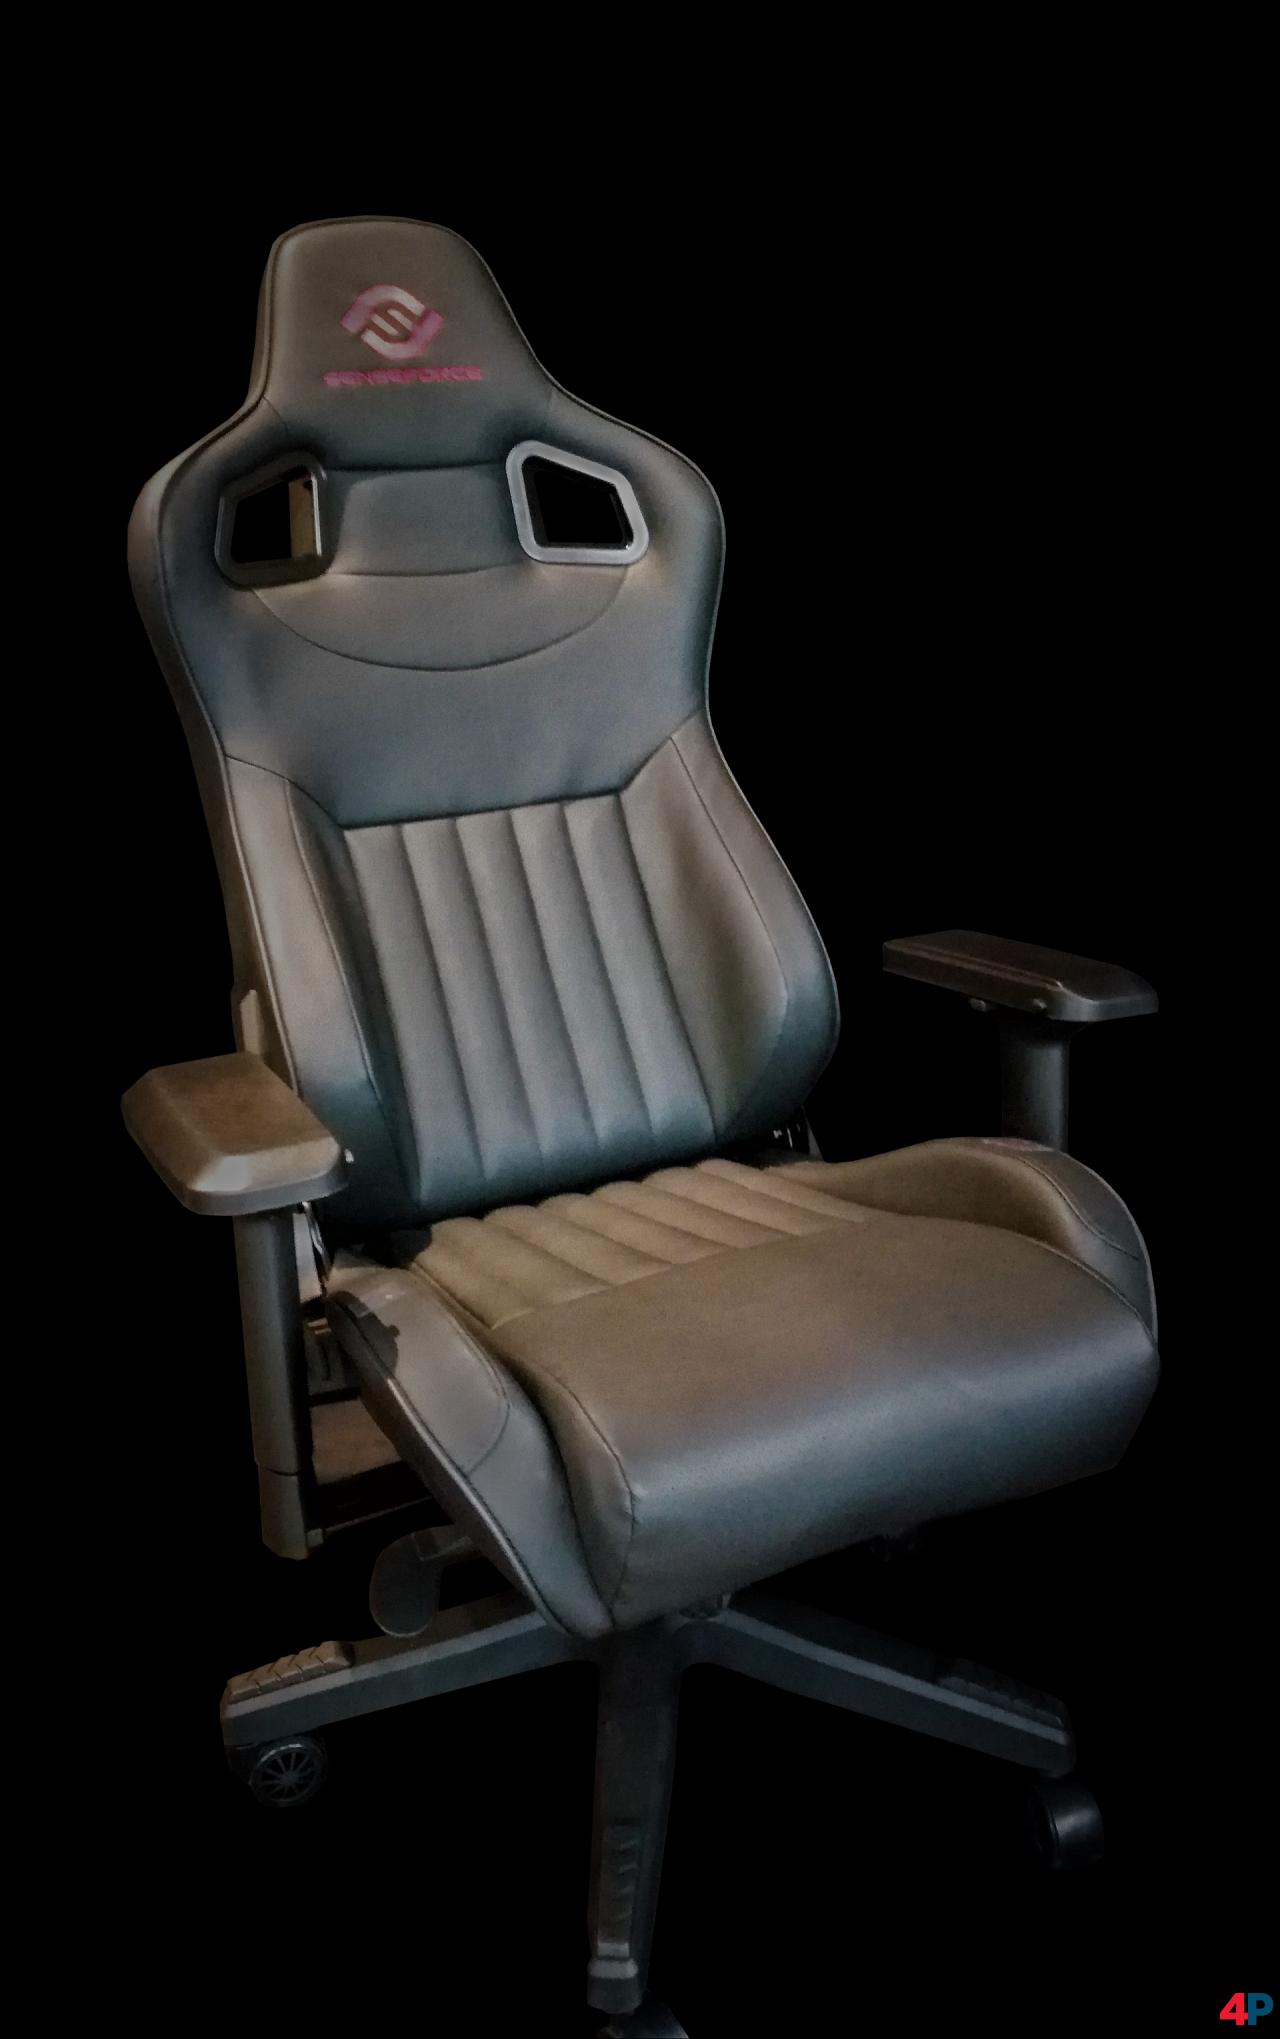 Sense Force Chair Extreme Gaming Stuhl Mit Vibrationseffekten Bei Kickstarter